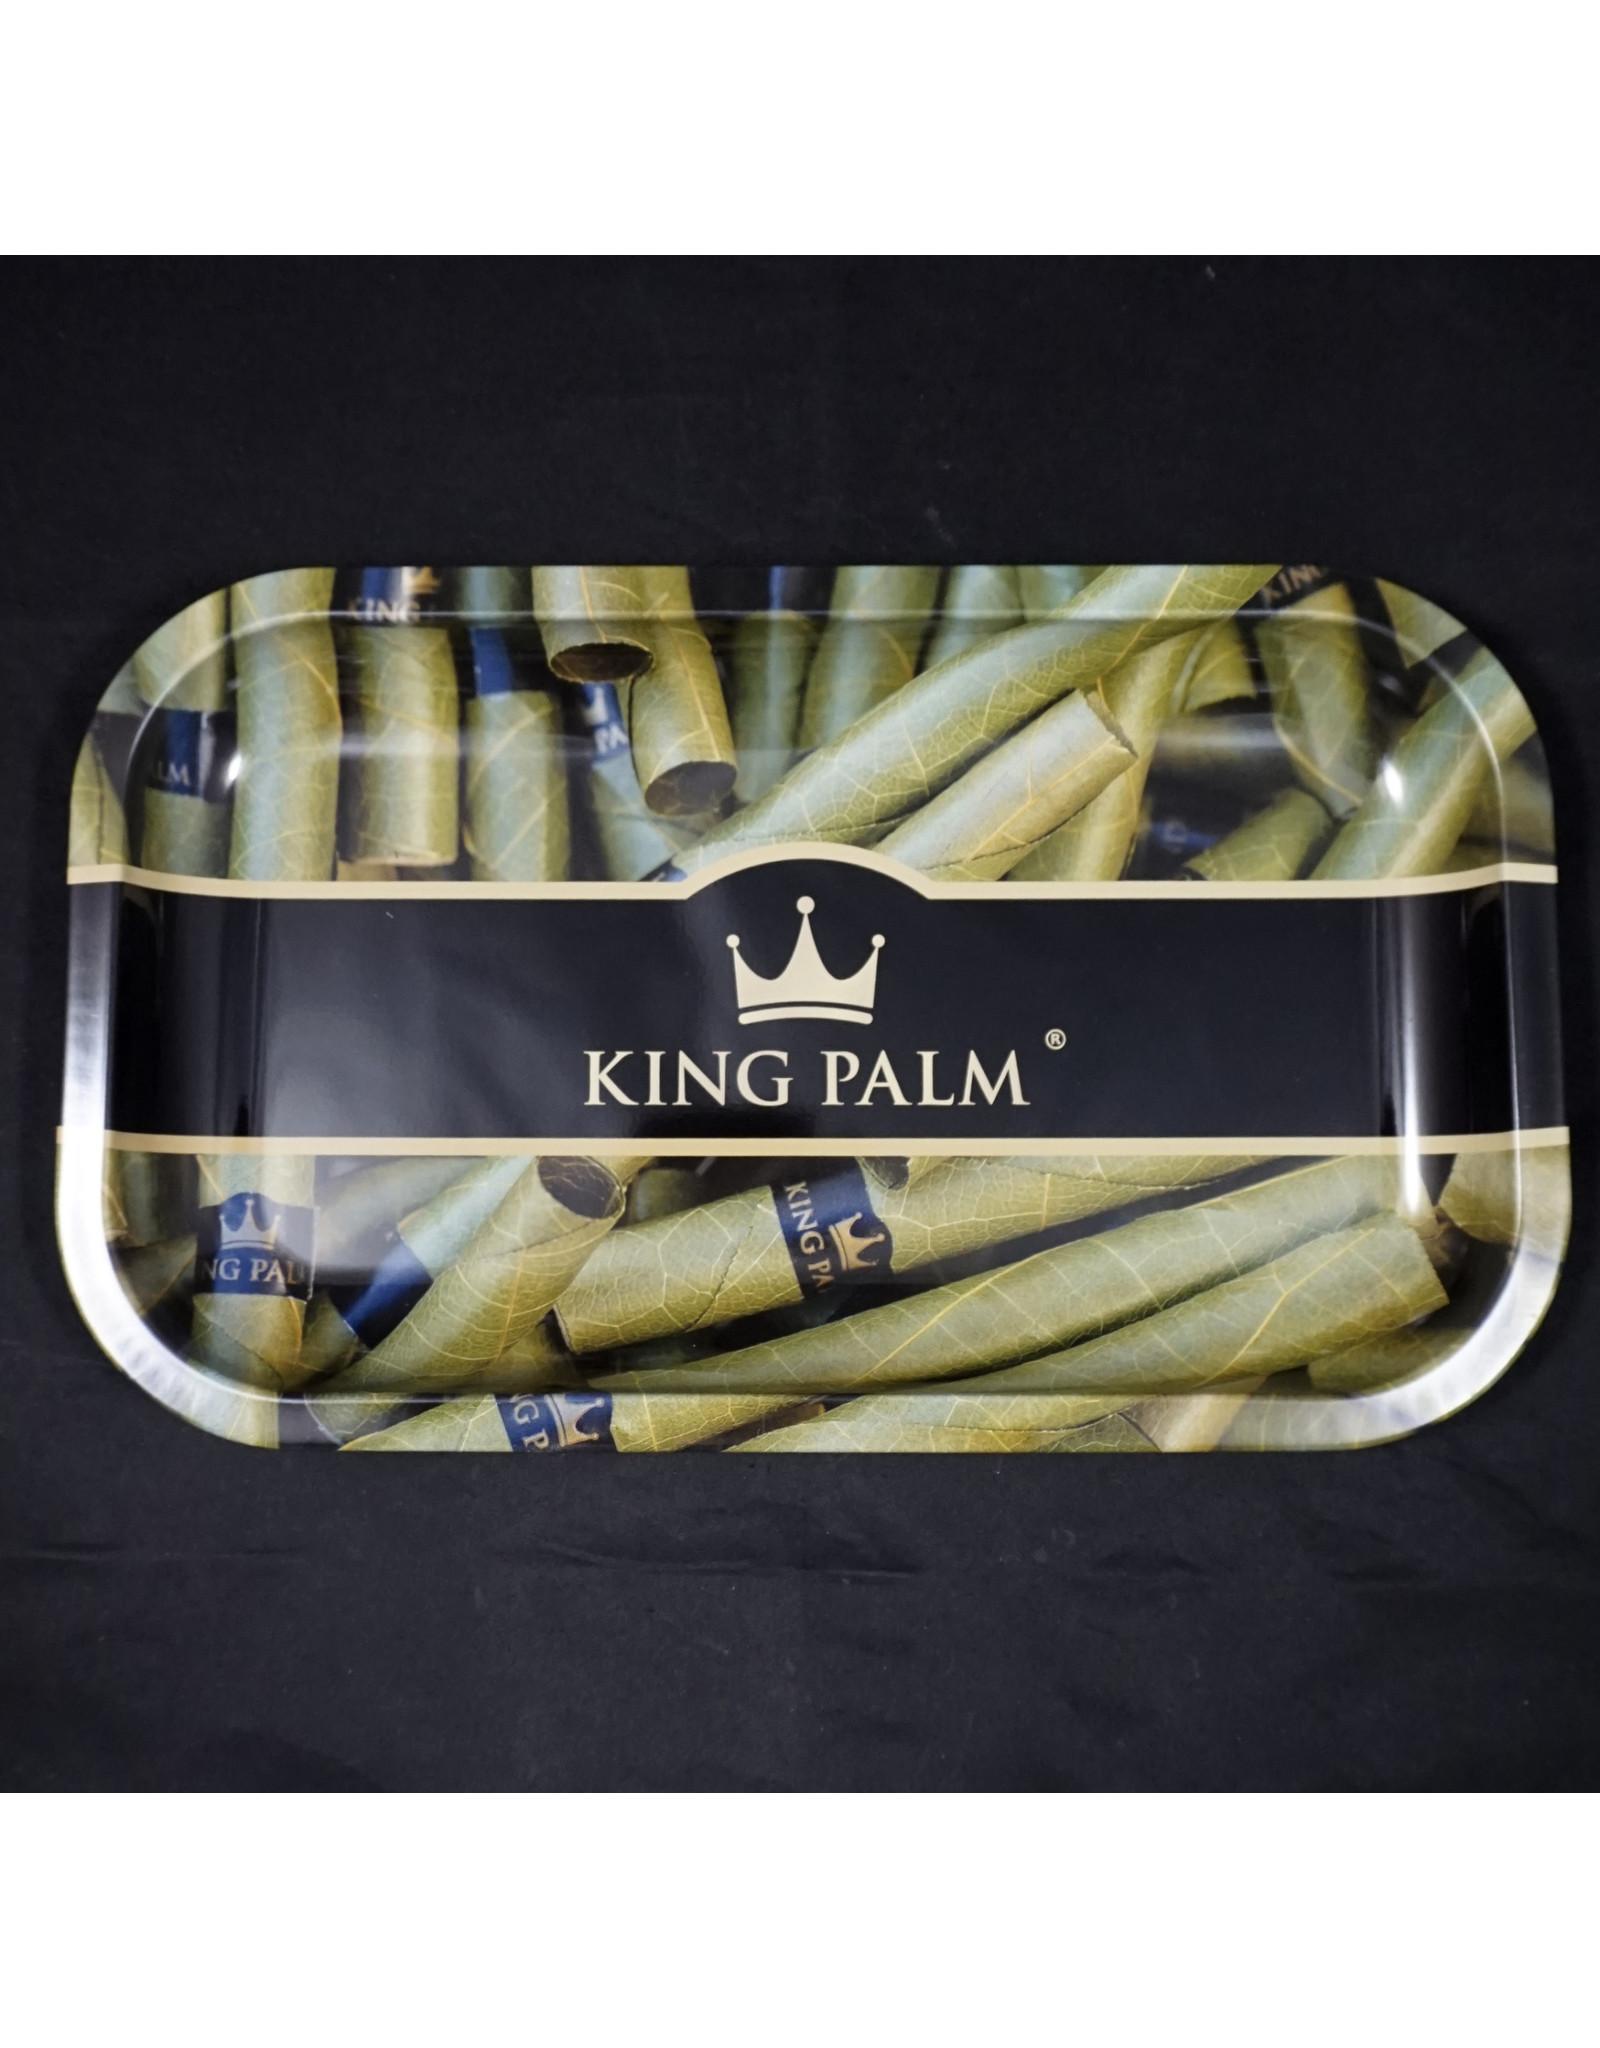 King Palm King Palm Pre-Roll Medium Rolling Tray